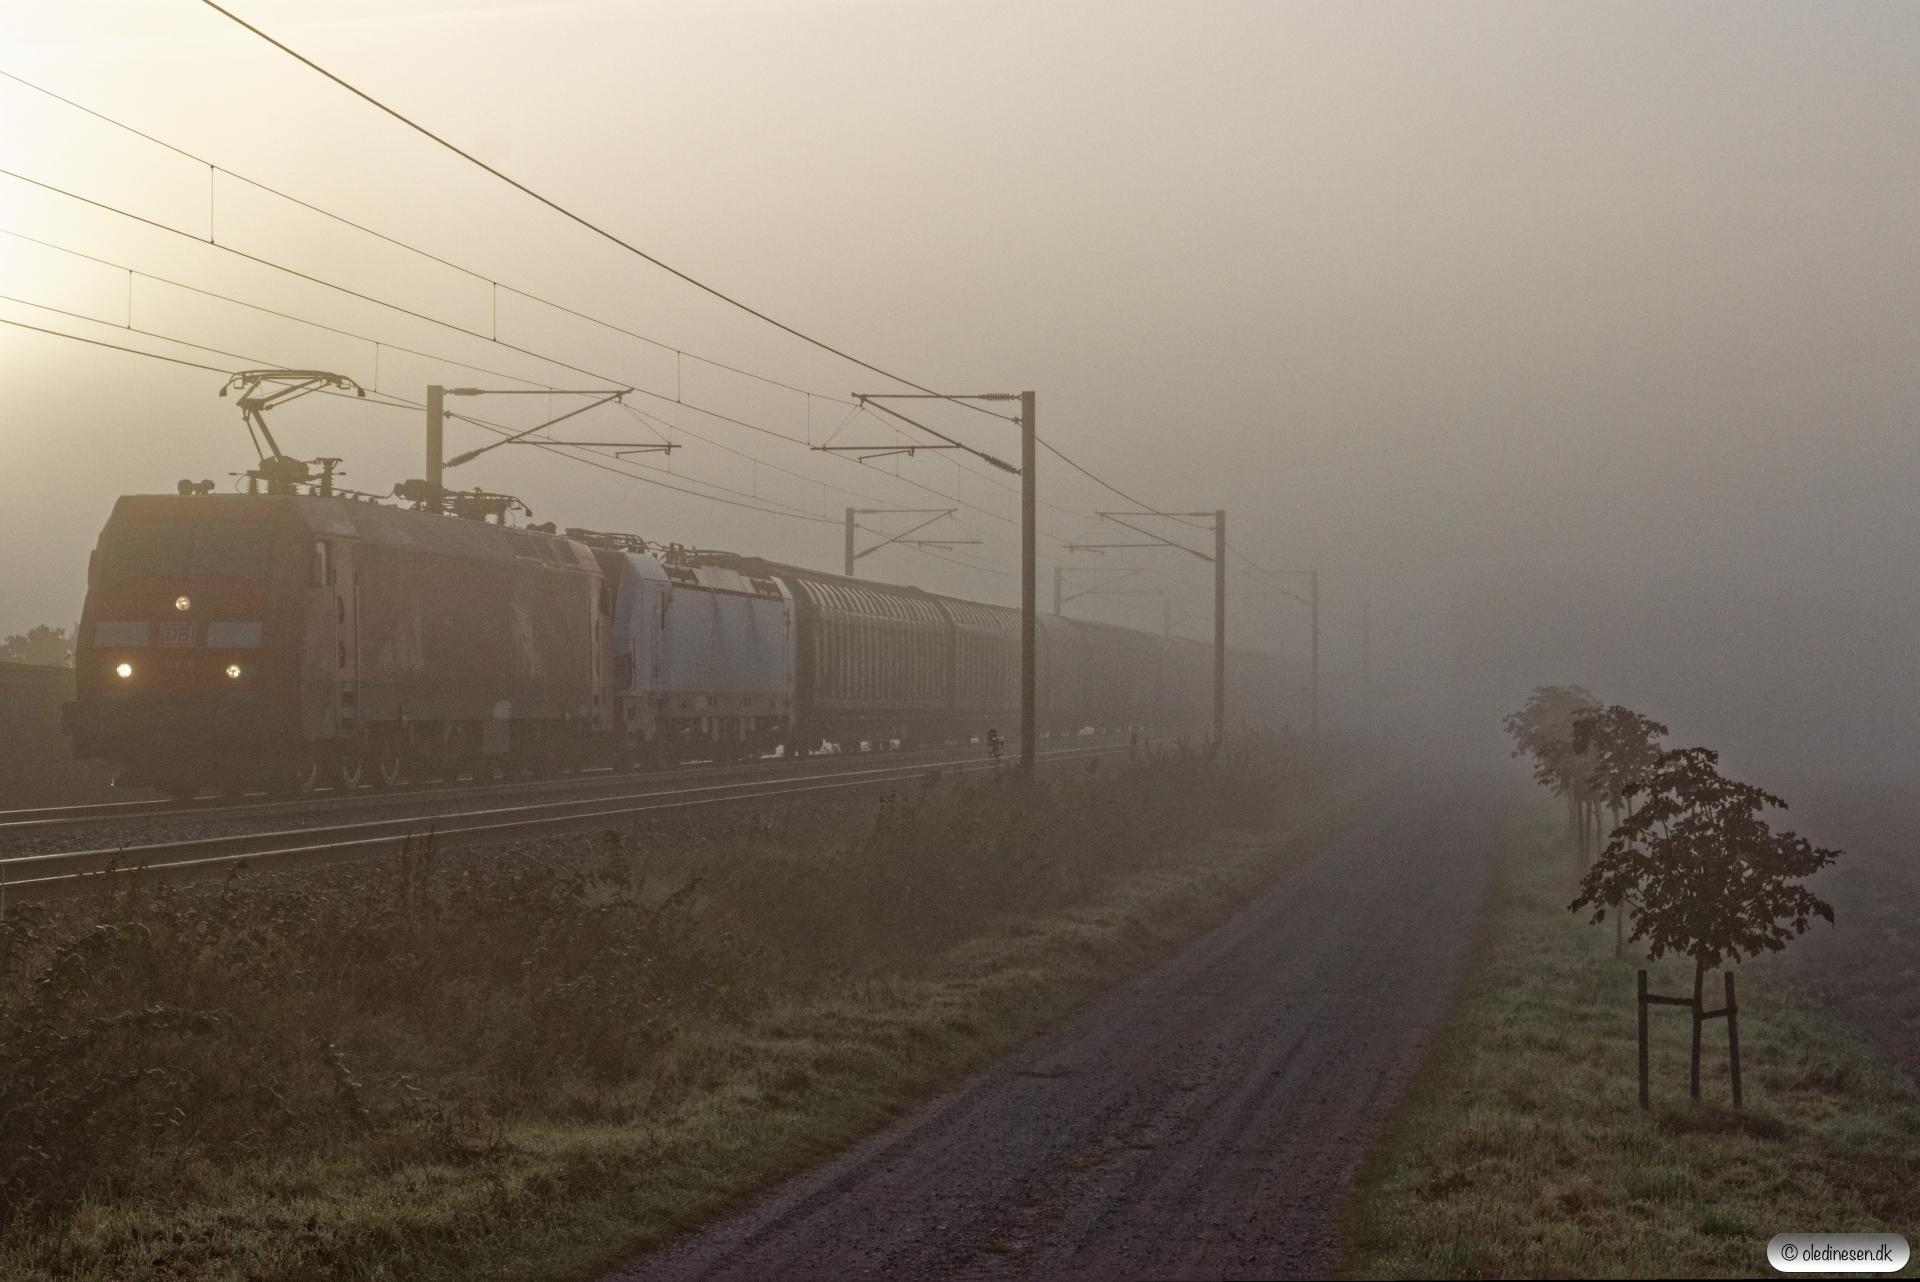 DBCSC EG 3110+HCTOR 243.221 med G 8093 Kø-Fa. Marslev 22.09.2019.